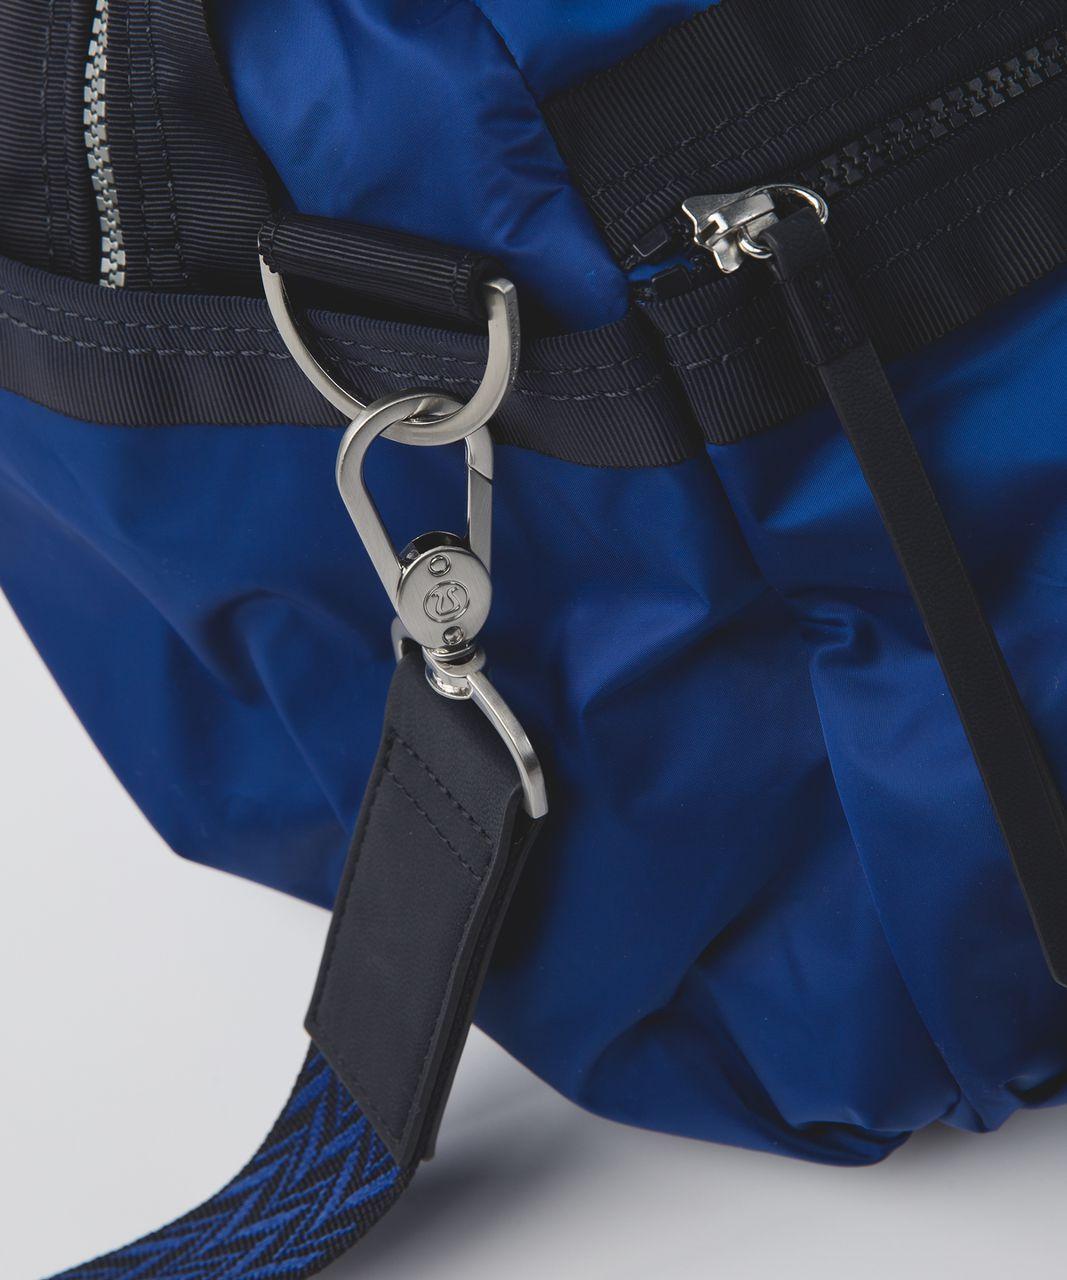 Lululemon Gym To Win Duffel - Sapphire Blue / Naval Blue